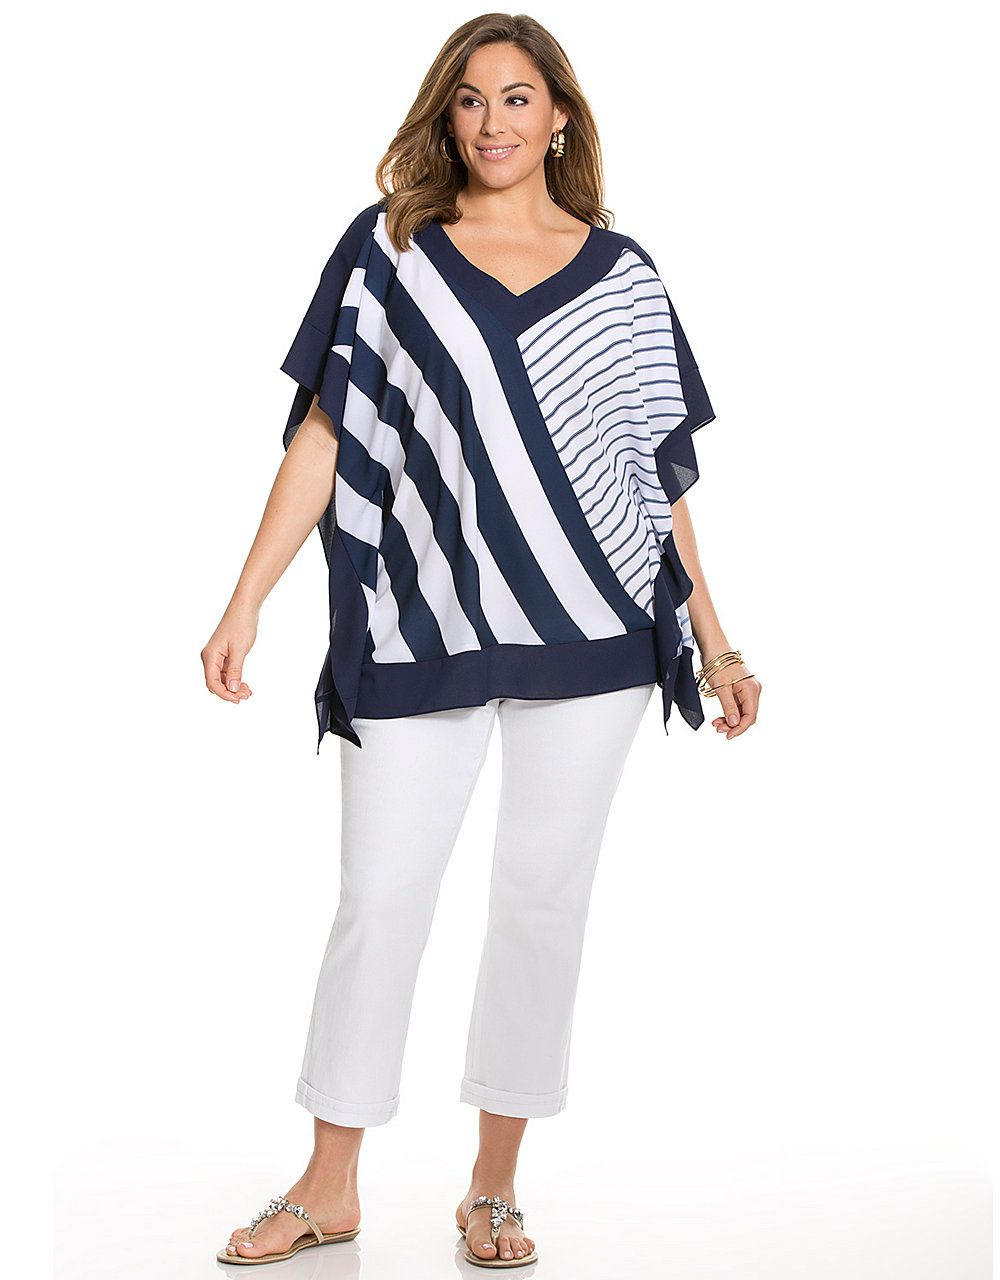 c52567197e Plus Size Resort Wear Dressy Tops Vacation Resorts, Beach Vacation Outfits, Vacation  Wear,